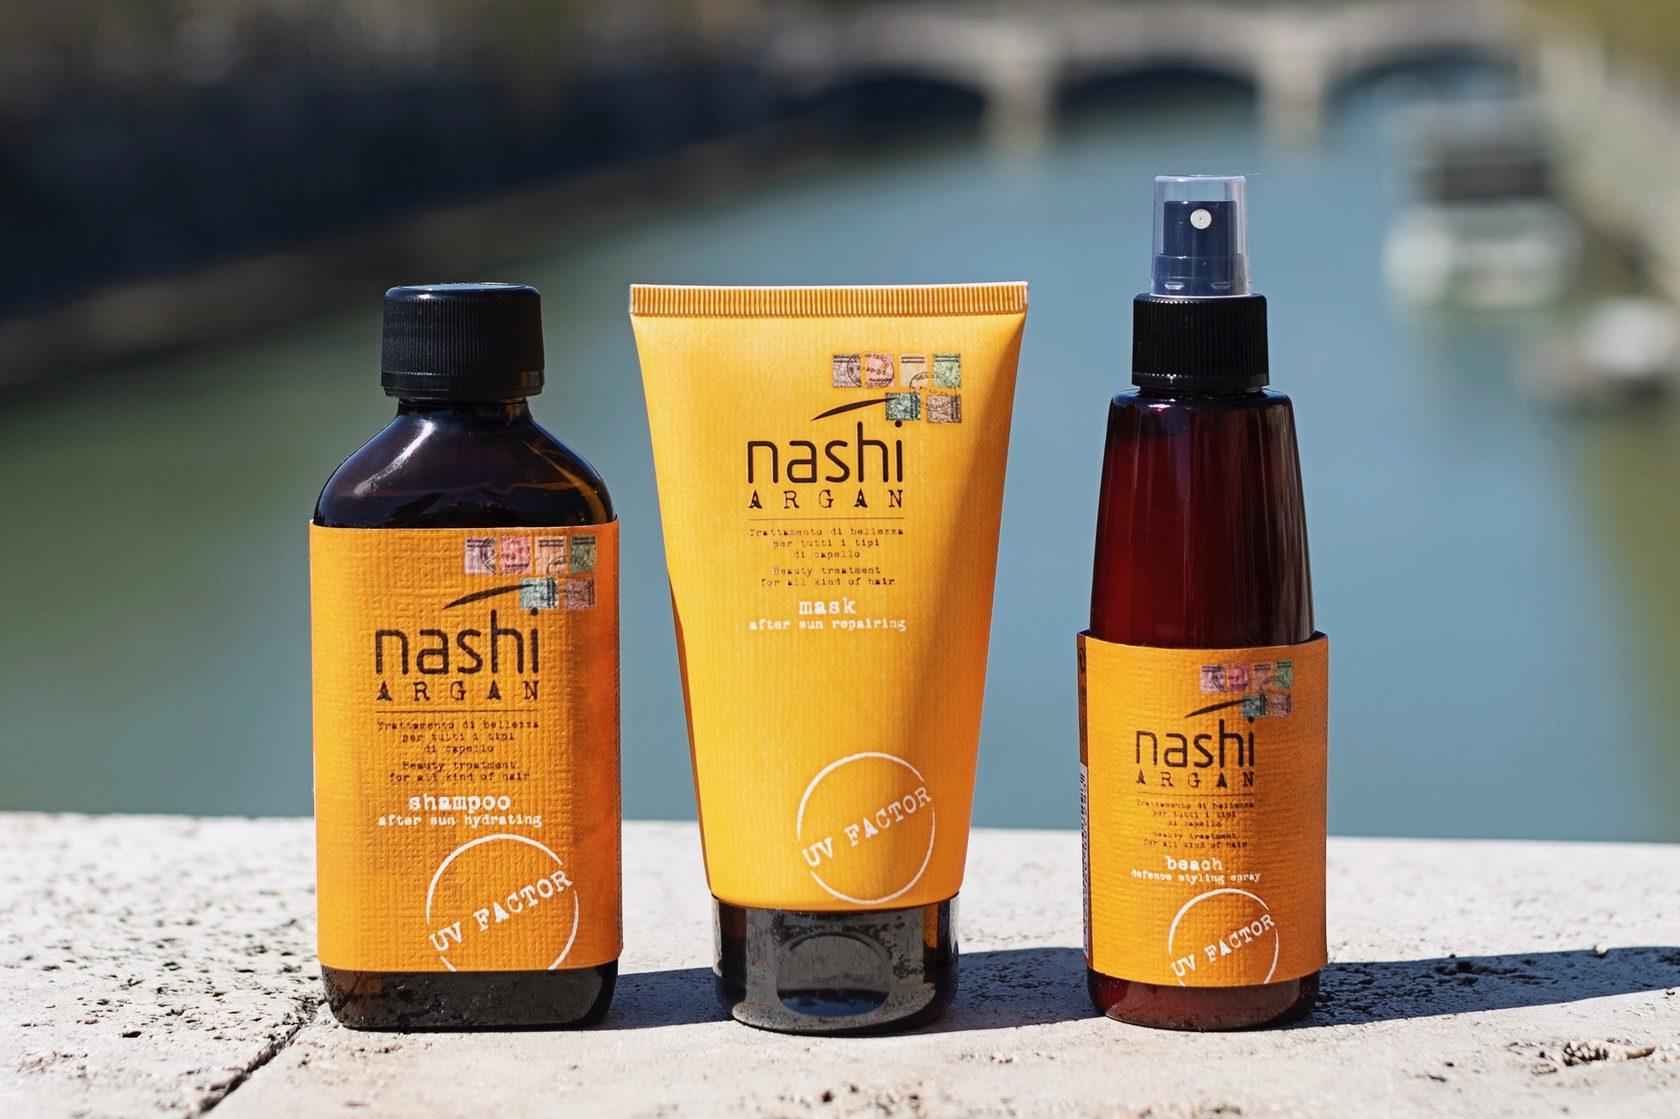 Nashi косметика купить avon вместе против рака